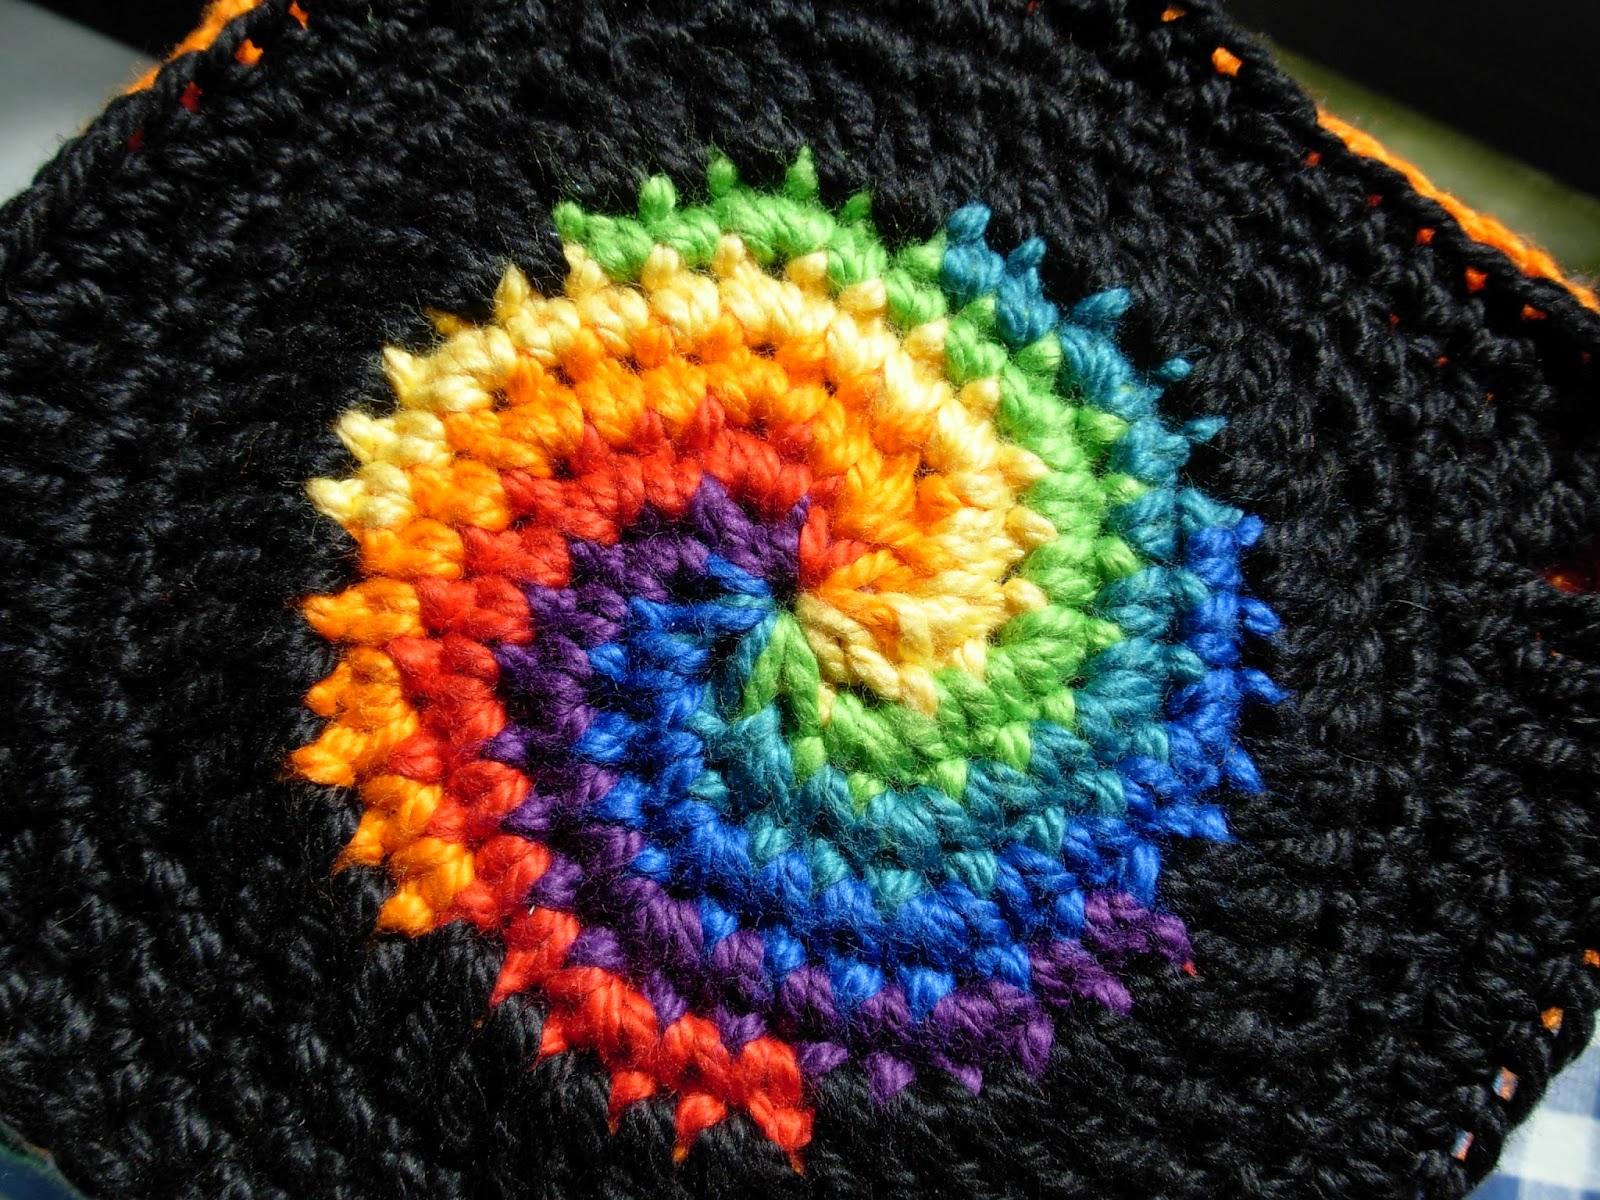 häkeln in Regenbogenfarben